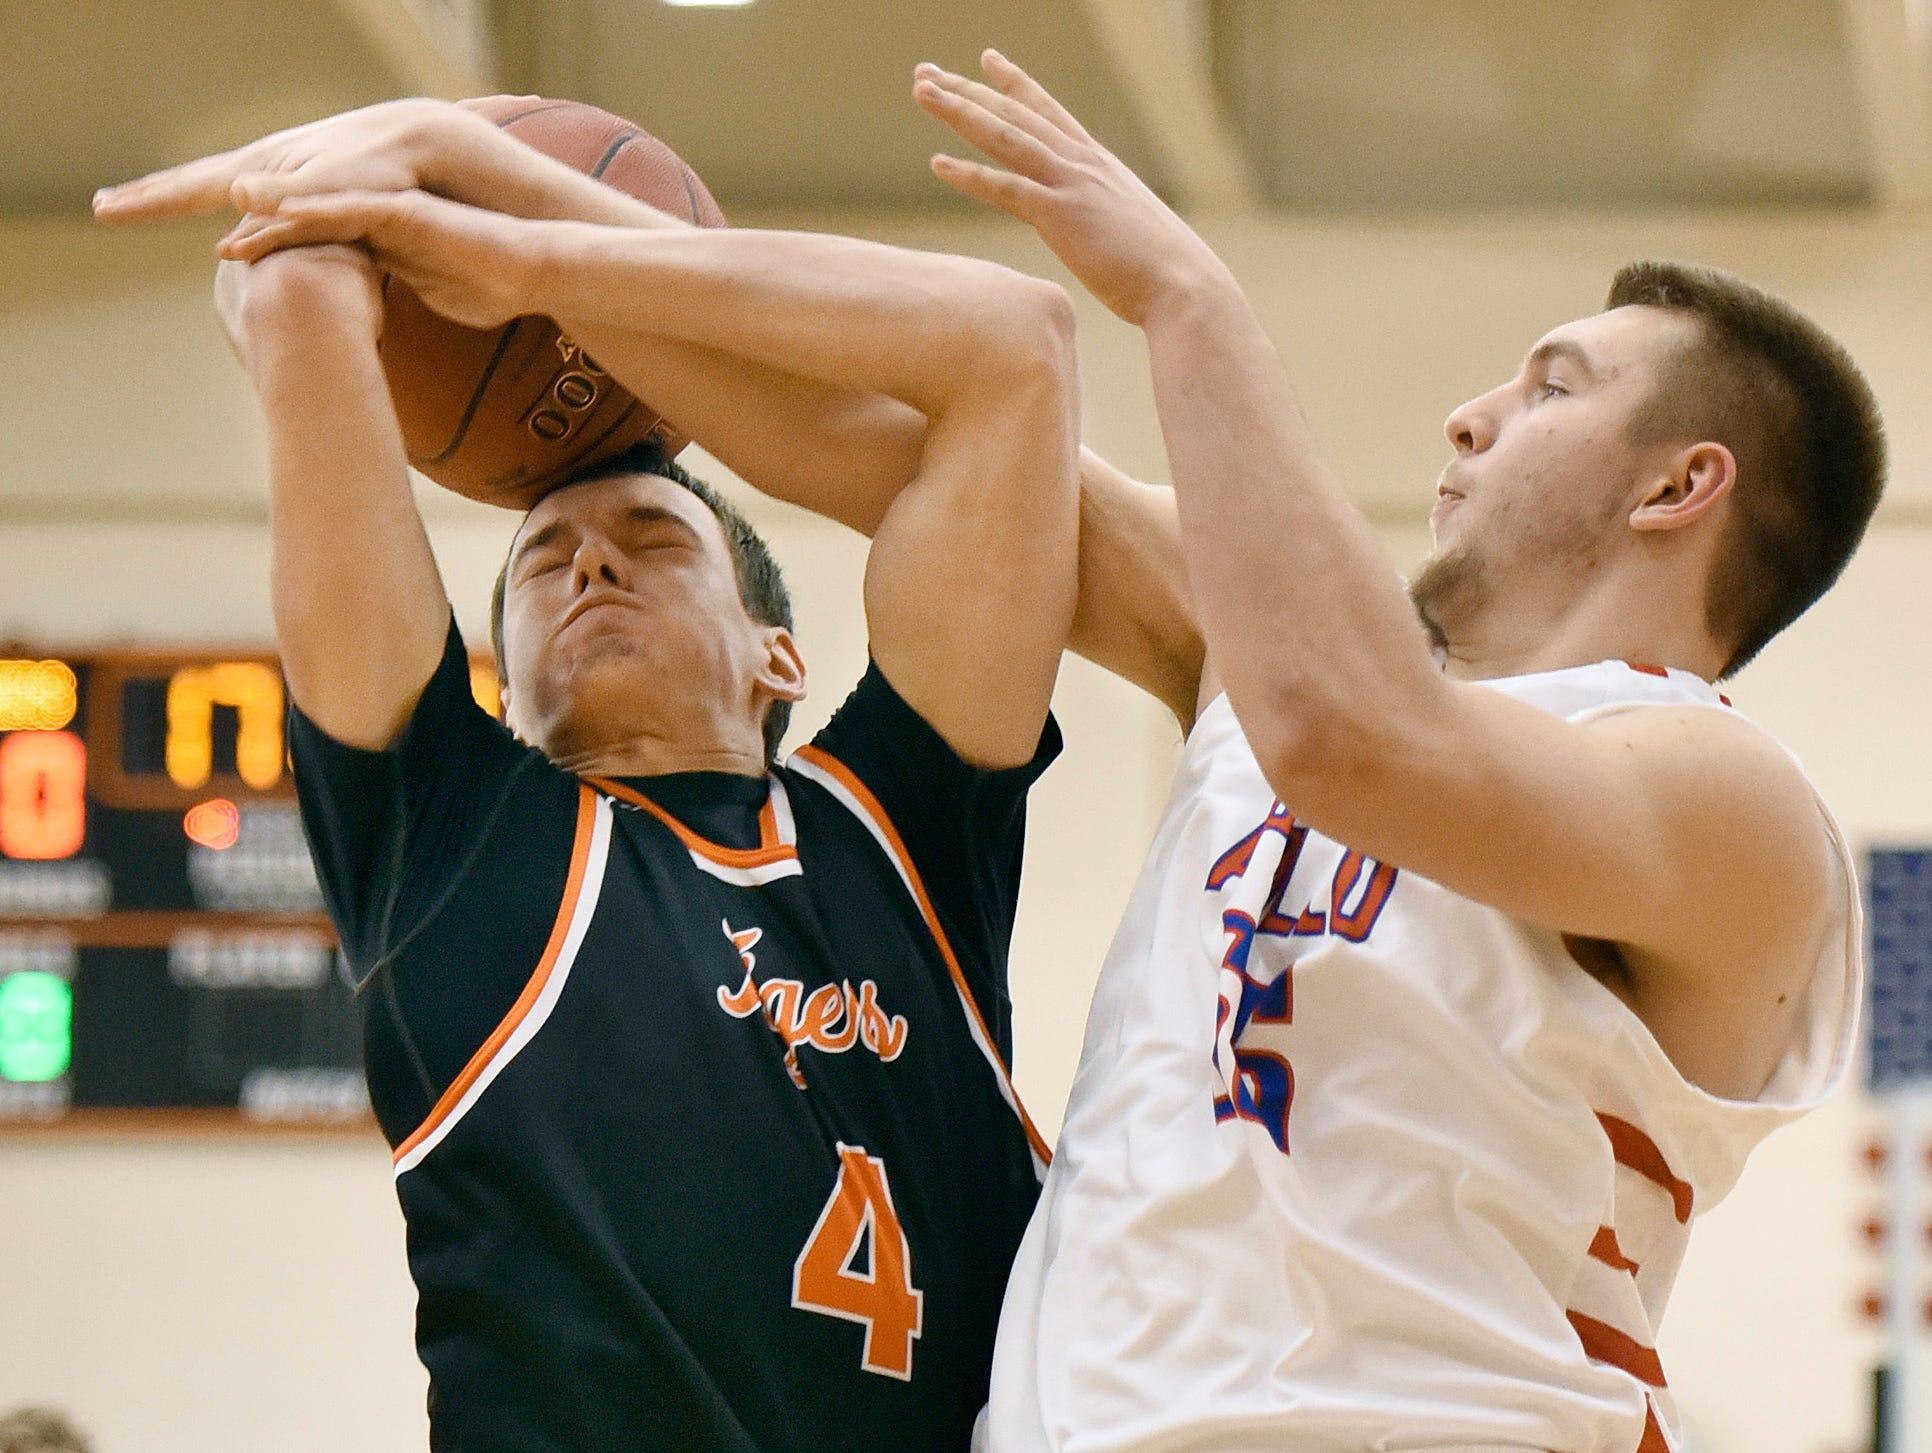 Tech's Max Martig has his shot blocked by Apollo's Luke Dunsmoor under the basket during the first half Tuesday Dec. 8 at Apollo High School.